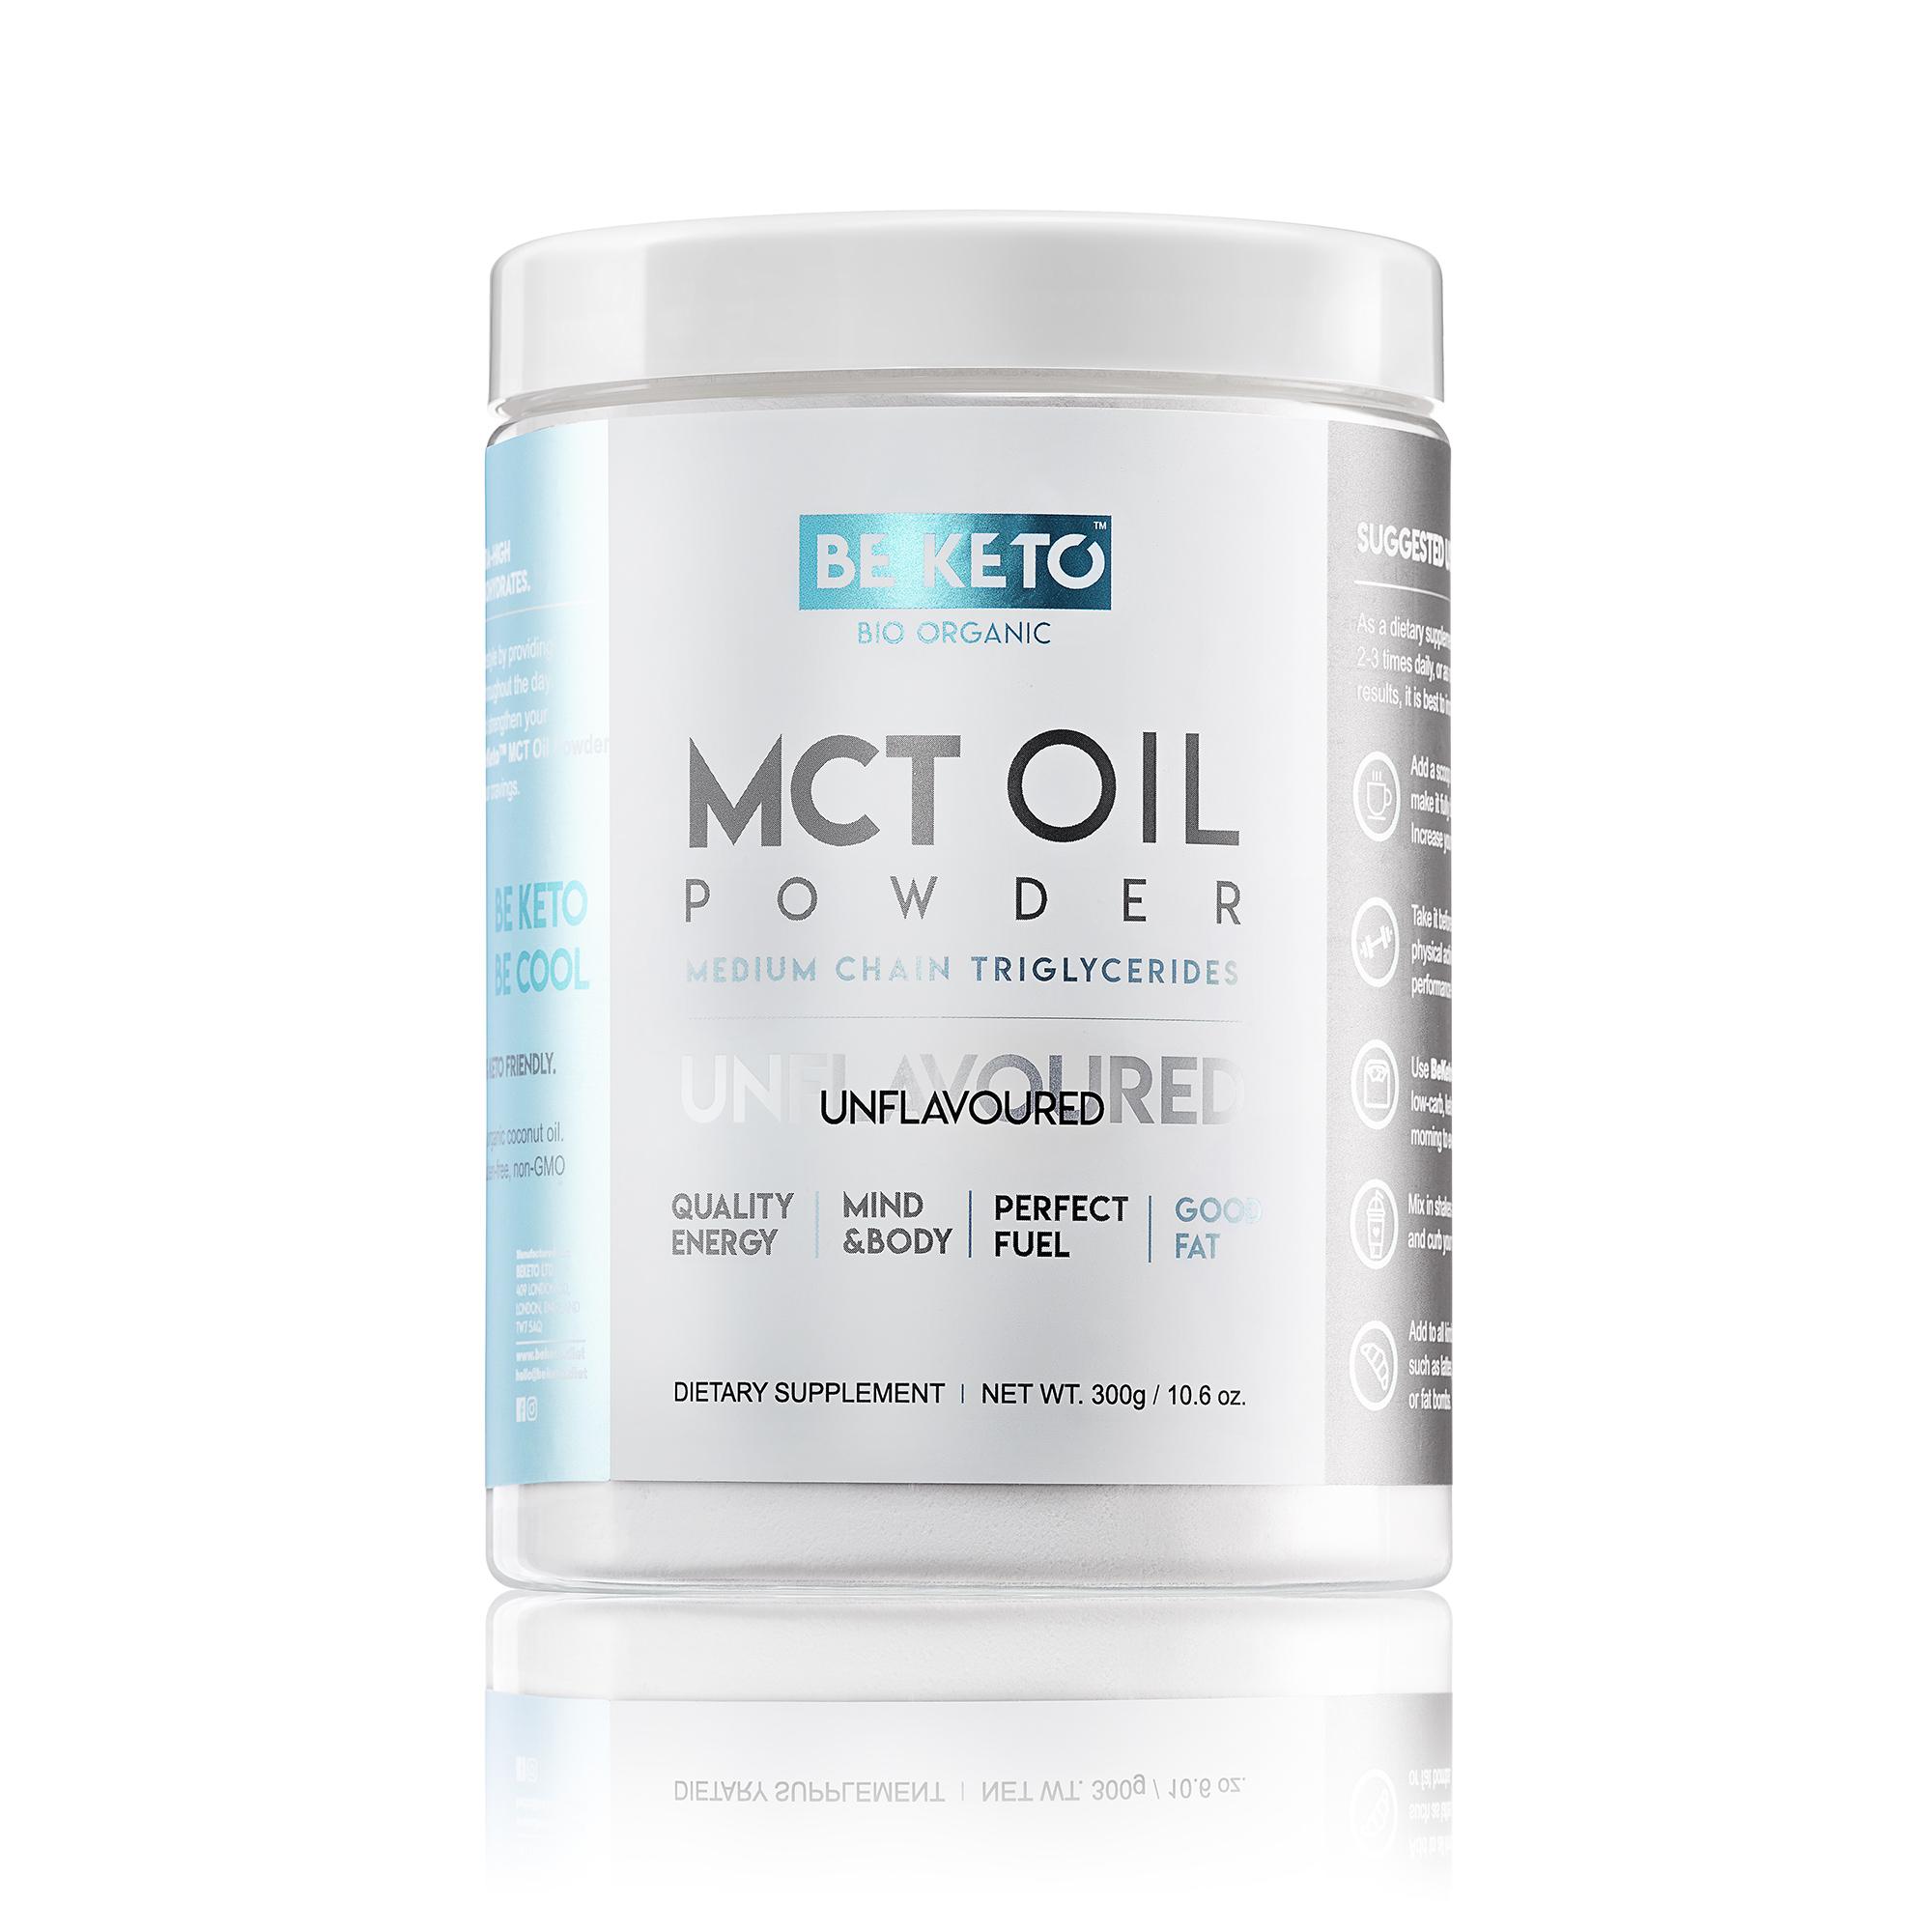 MCT Oil Powder - Unflavoured